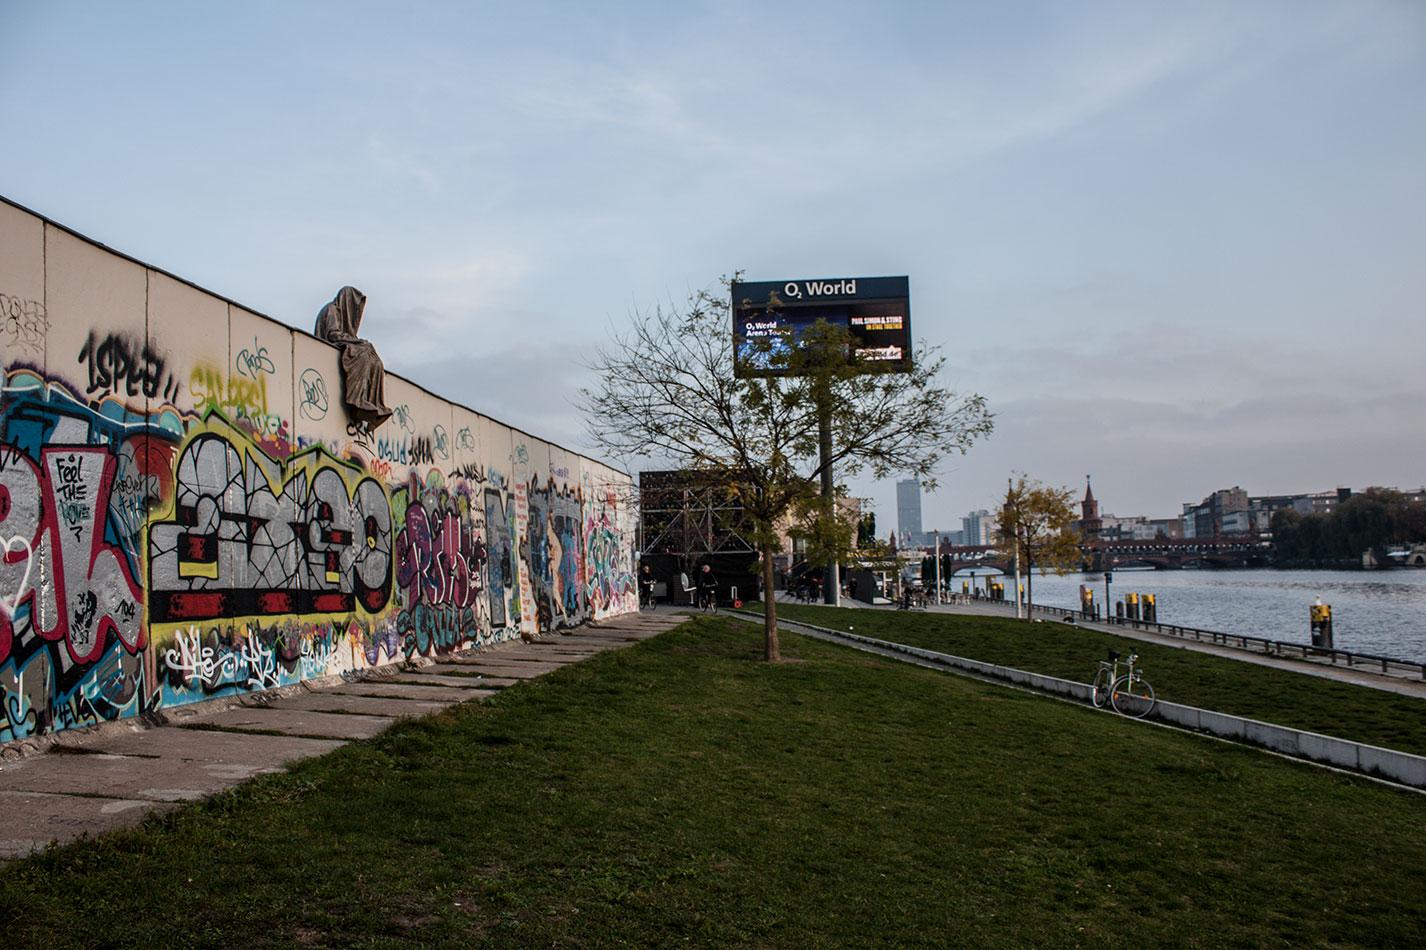 25-jears-wallfall-berlin-germany-contemporary-fine-art-show-arts-design-guardians-of-time-manfred-kili-kielnhofer-4248